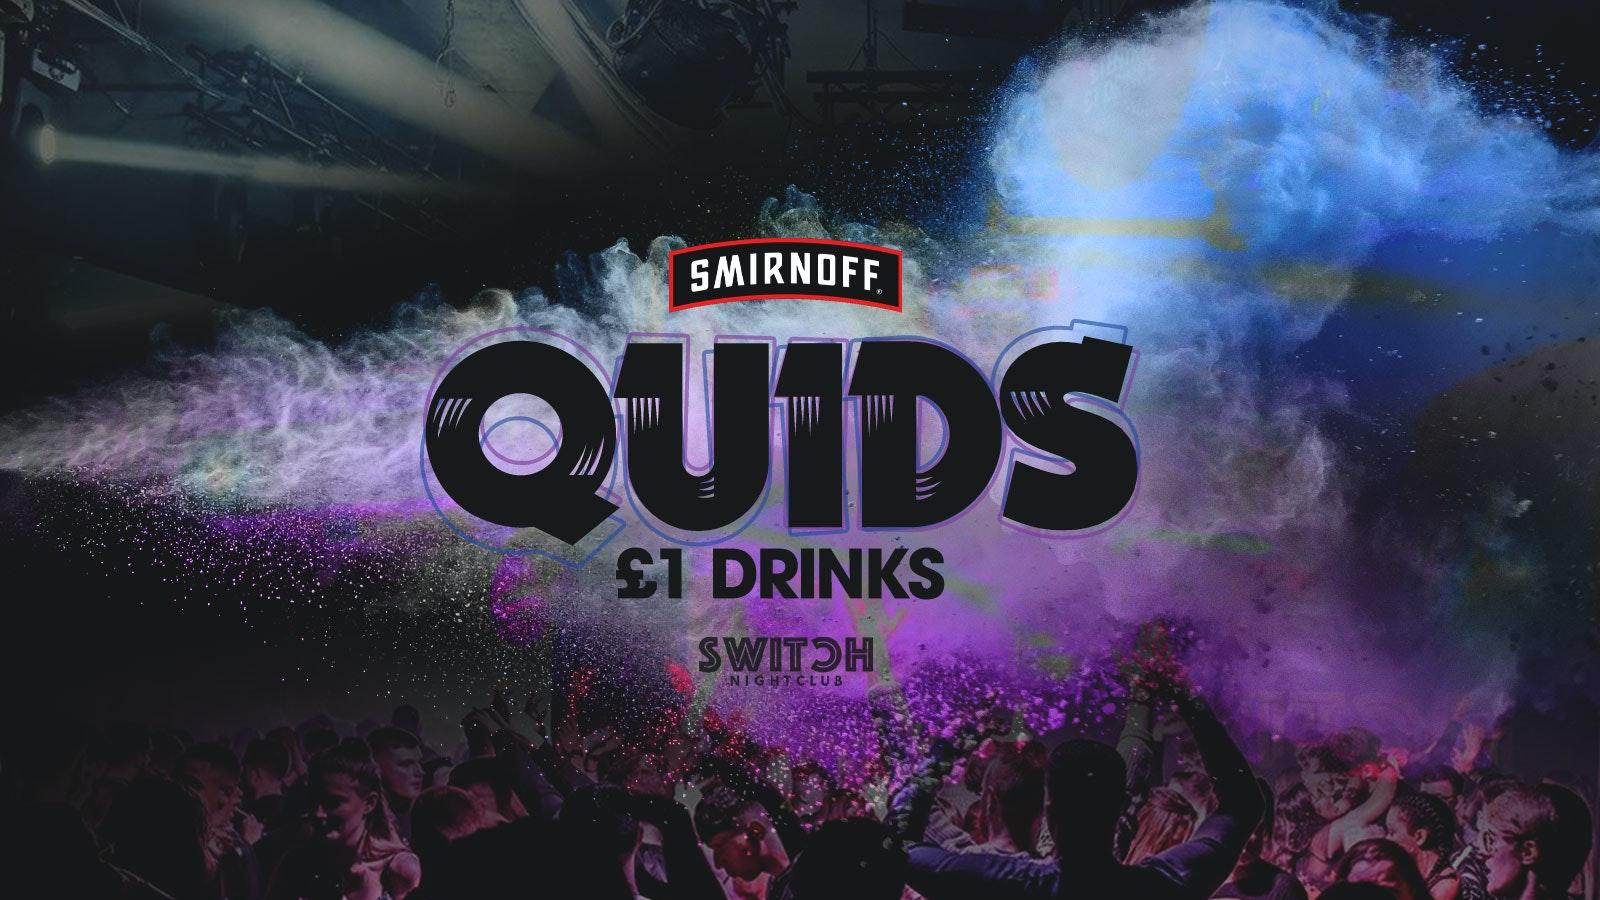 QUIDS FRIDAYS | Switch | £1 Drinks